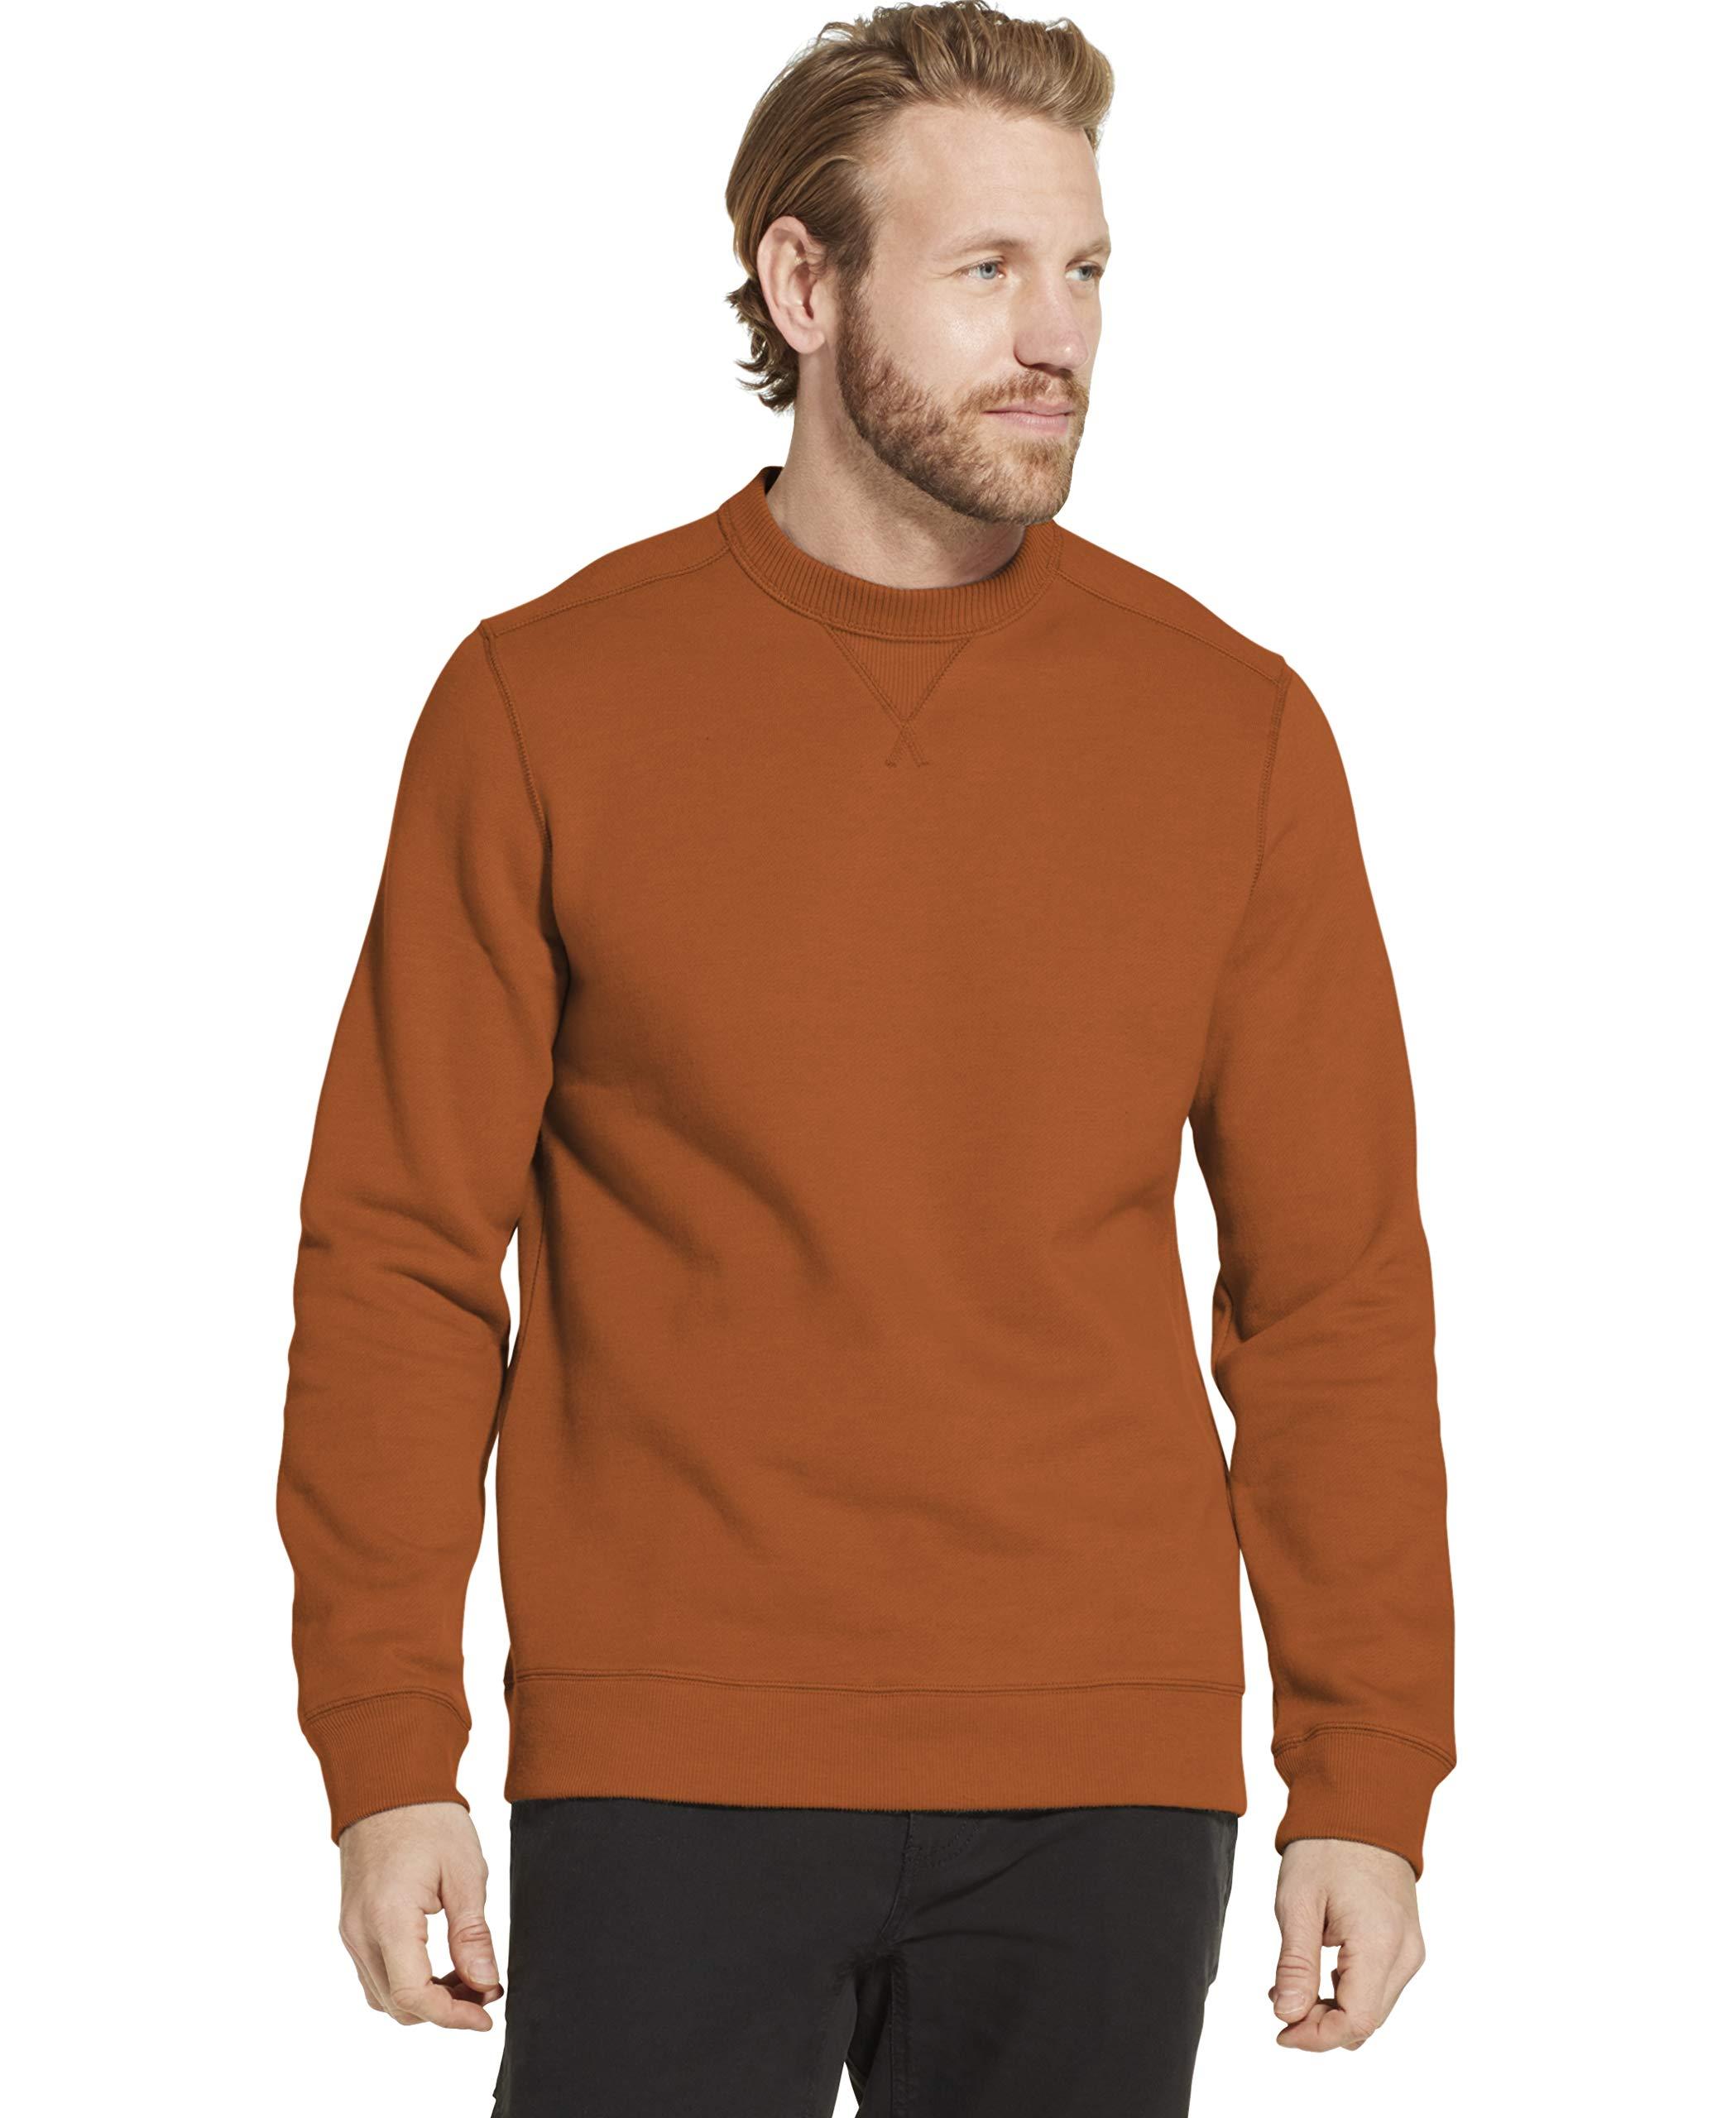 Dam Good Supply Co Performance Workwear Men's Durable Crewneck Fleece Sweatshirt (Regular Sizes)